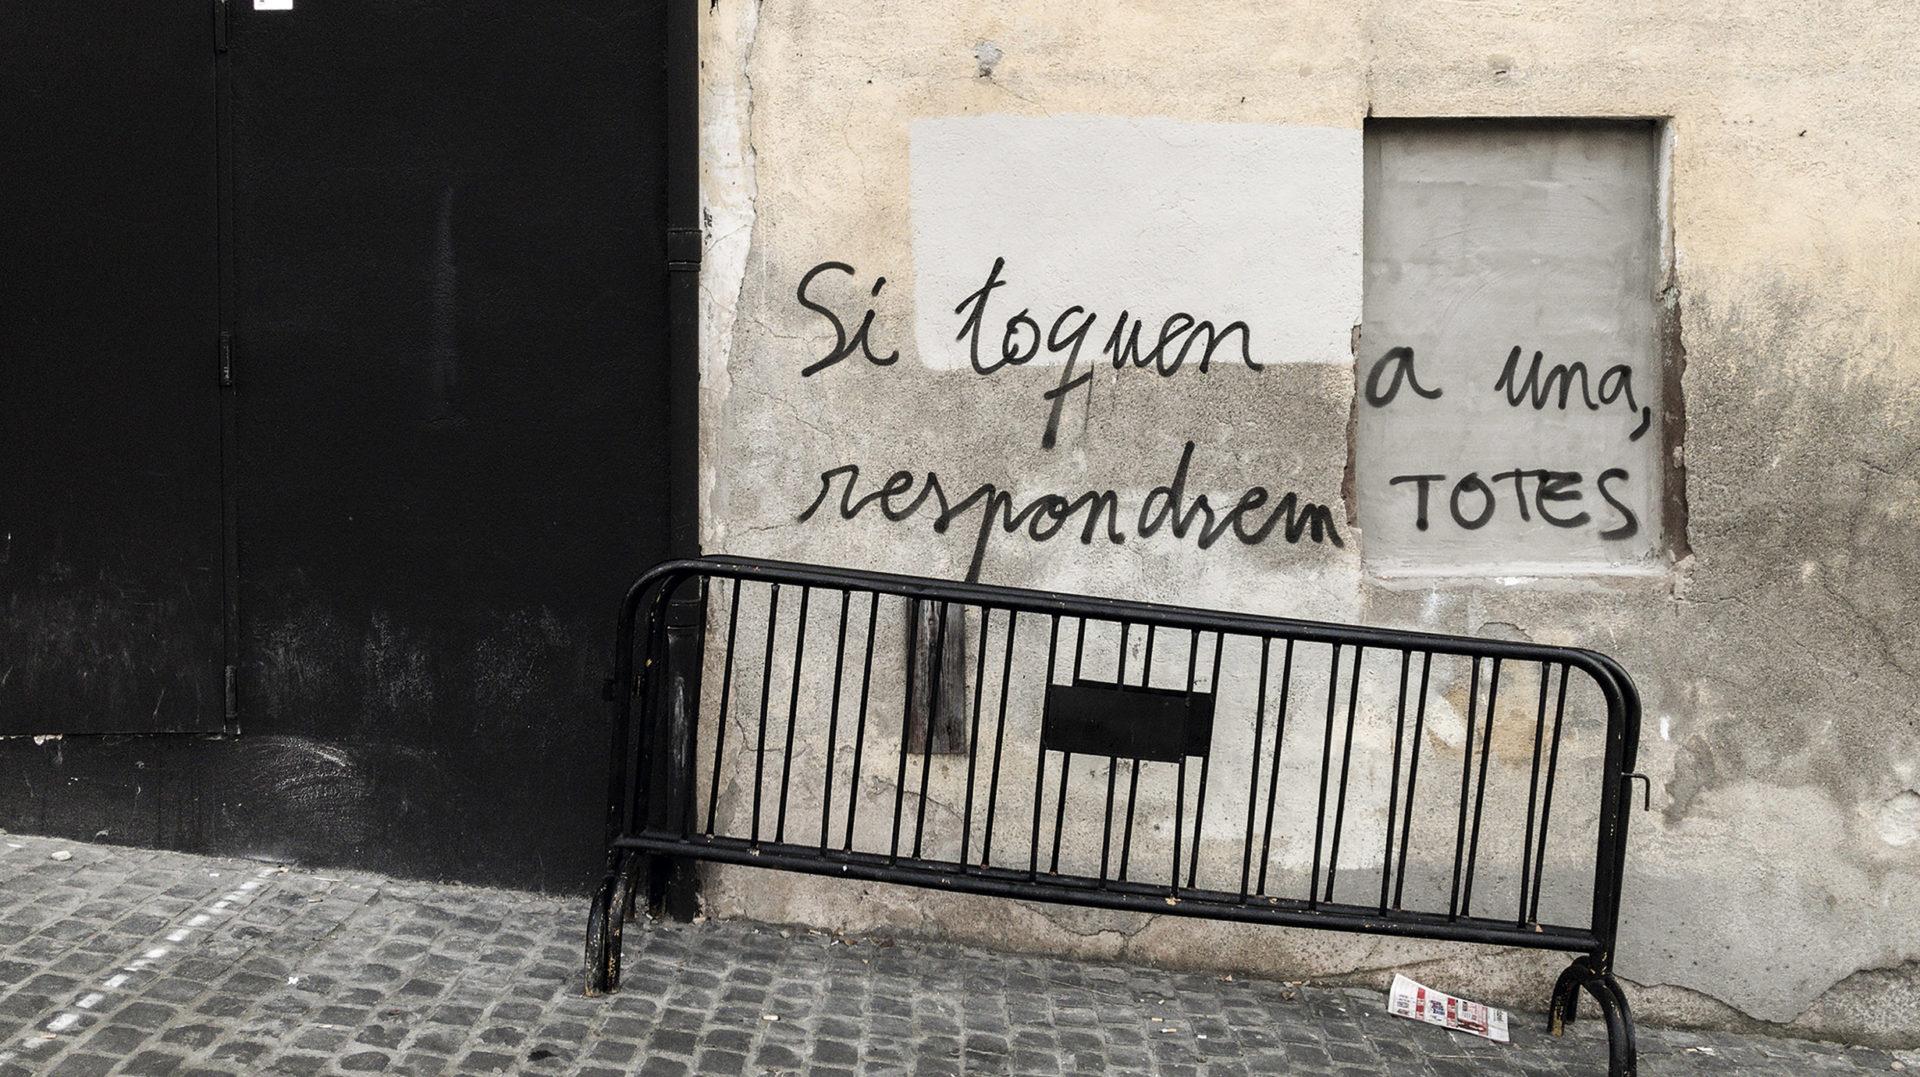 Quan les parets parlen